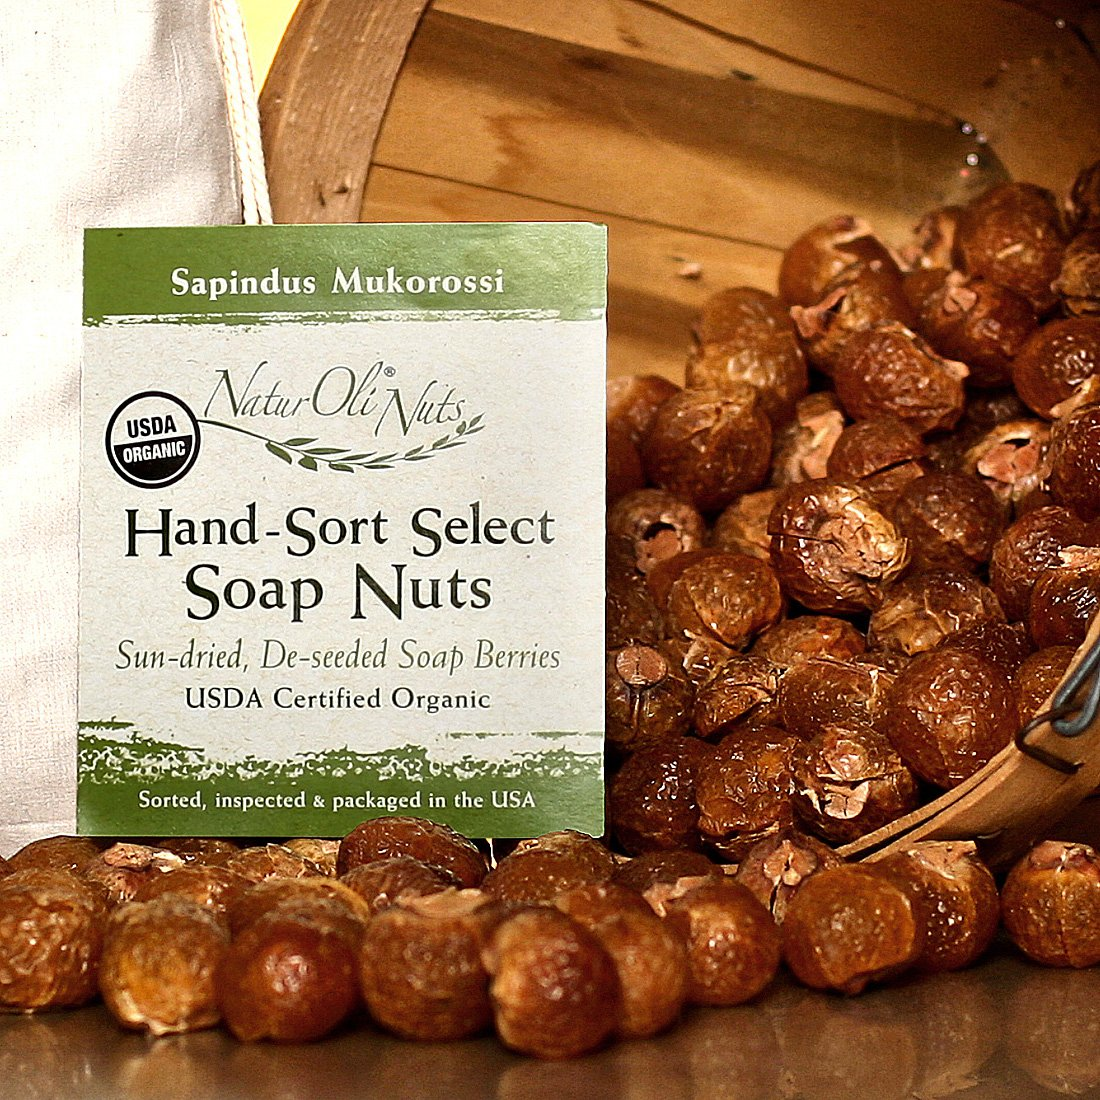 OVERSTOCK SALE!! NaturOli Organic Soap Nuts/Soap Berries PIECES/BULK - FIVE POUNDS (1000+ Loads) Seedless USDA Certified - Fresh Wild Harvest - Hypoallergenic, Non-toxic by NaturOli (Image #6)